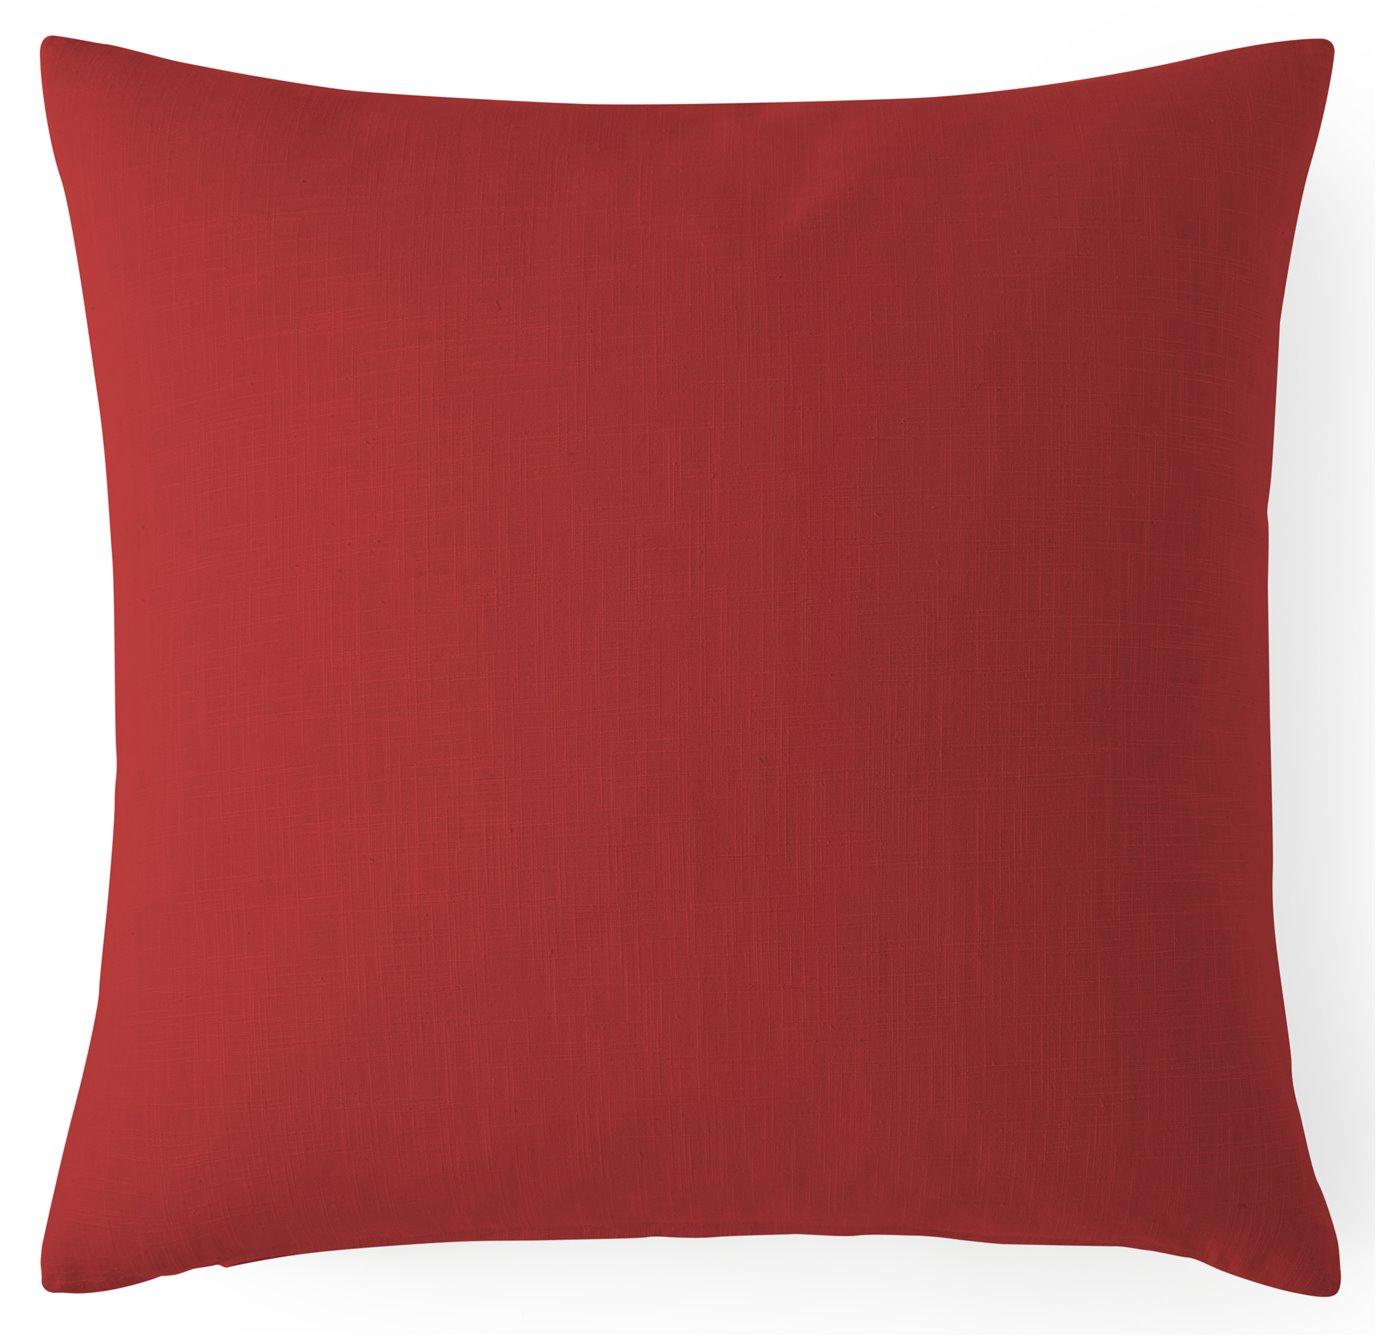 Cambric Red Euro Sham